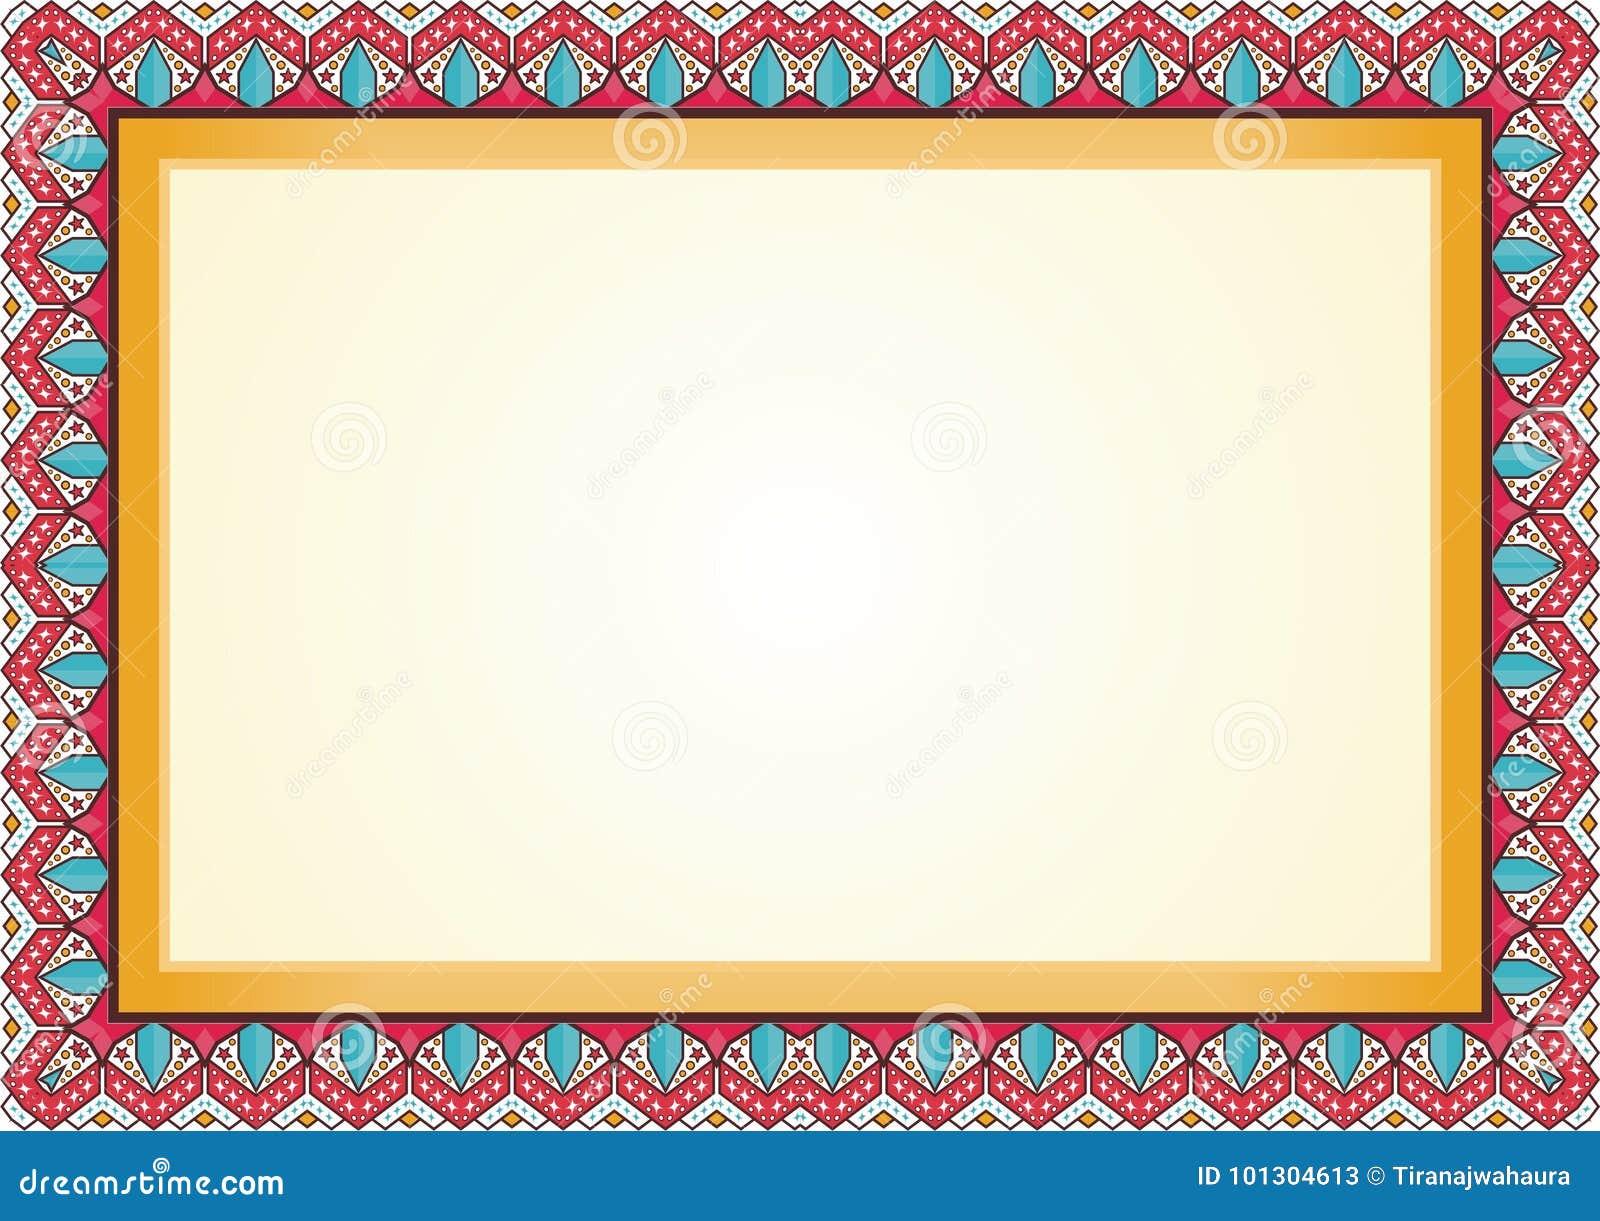 Certificate - Diploma Frame / Border Stock Vector - Illustration of ...